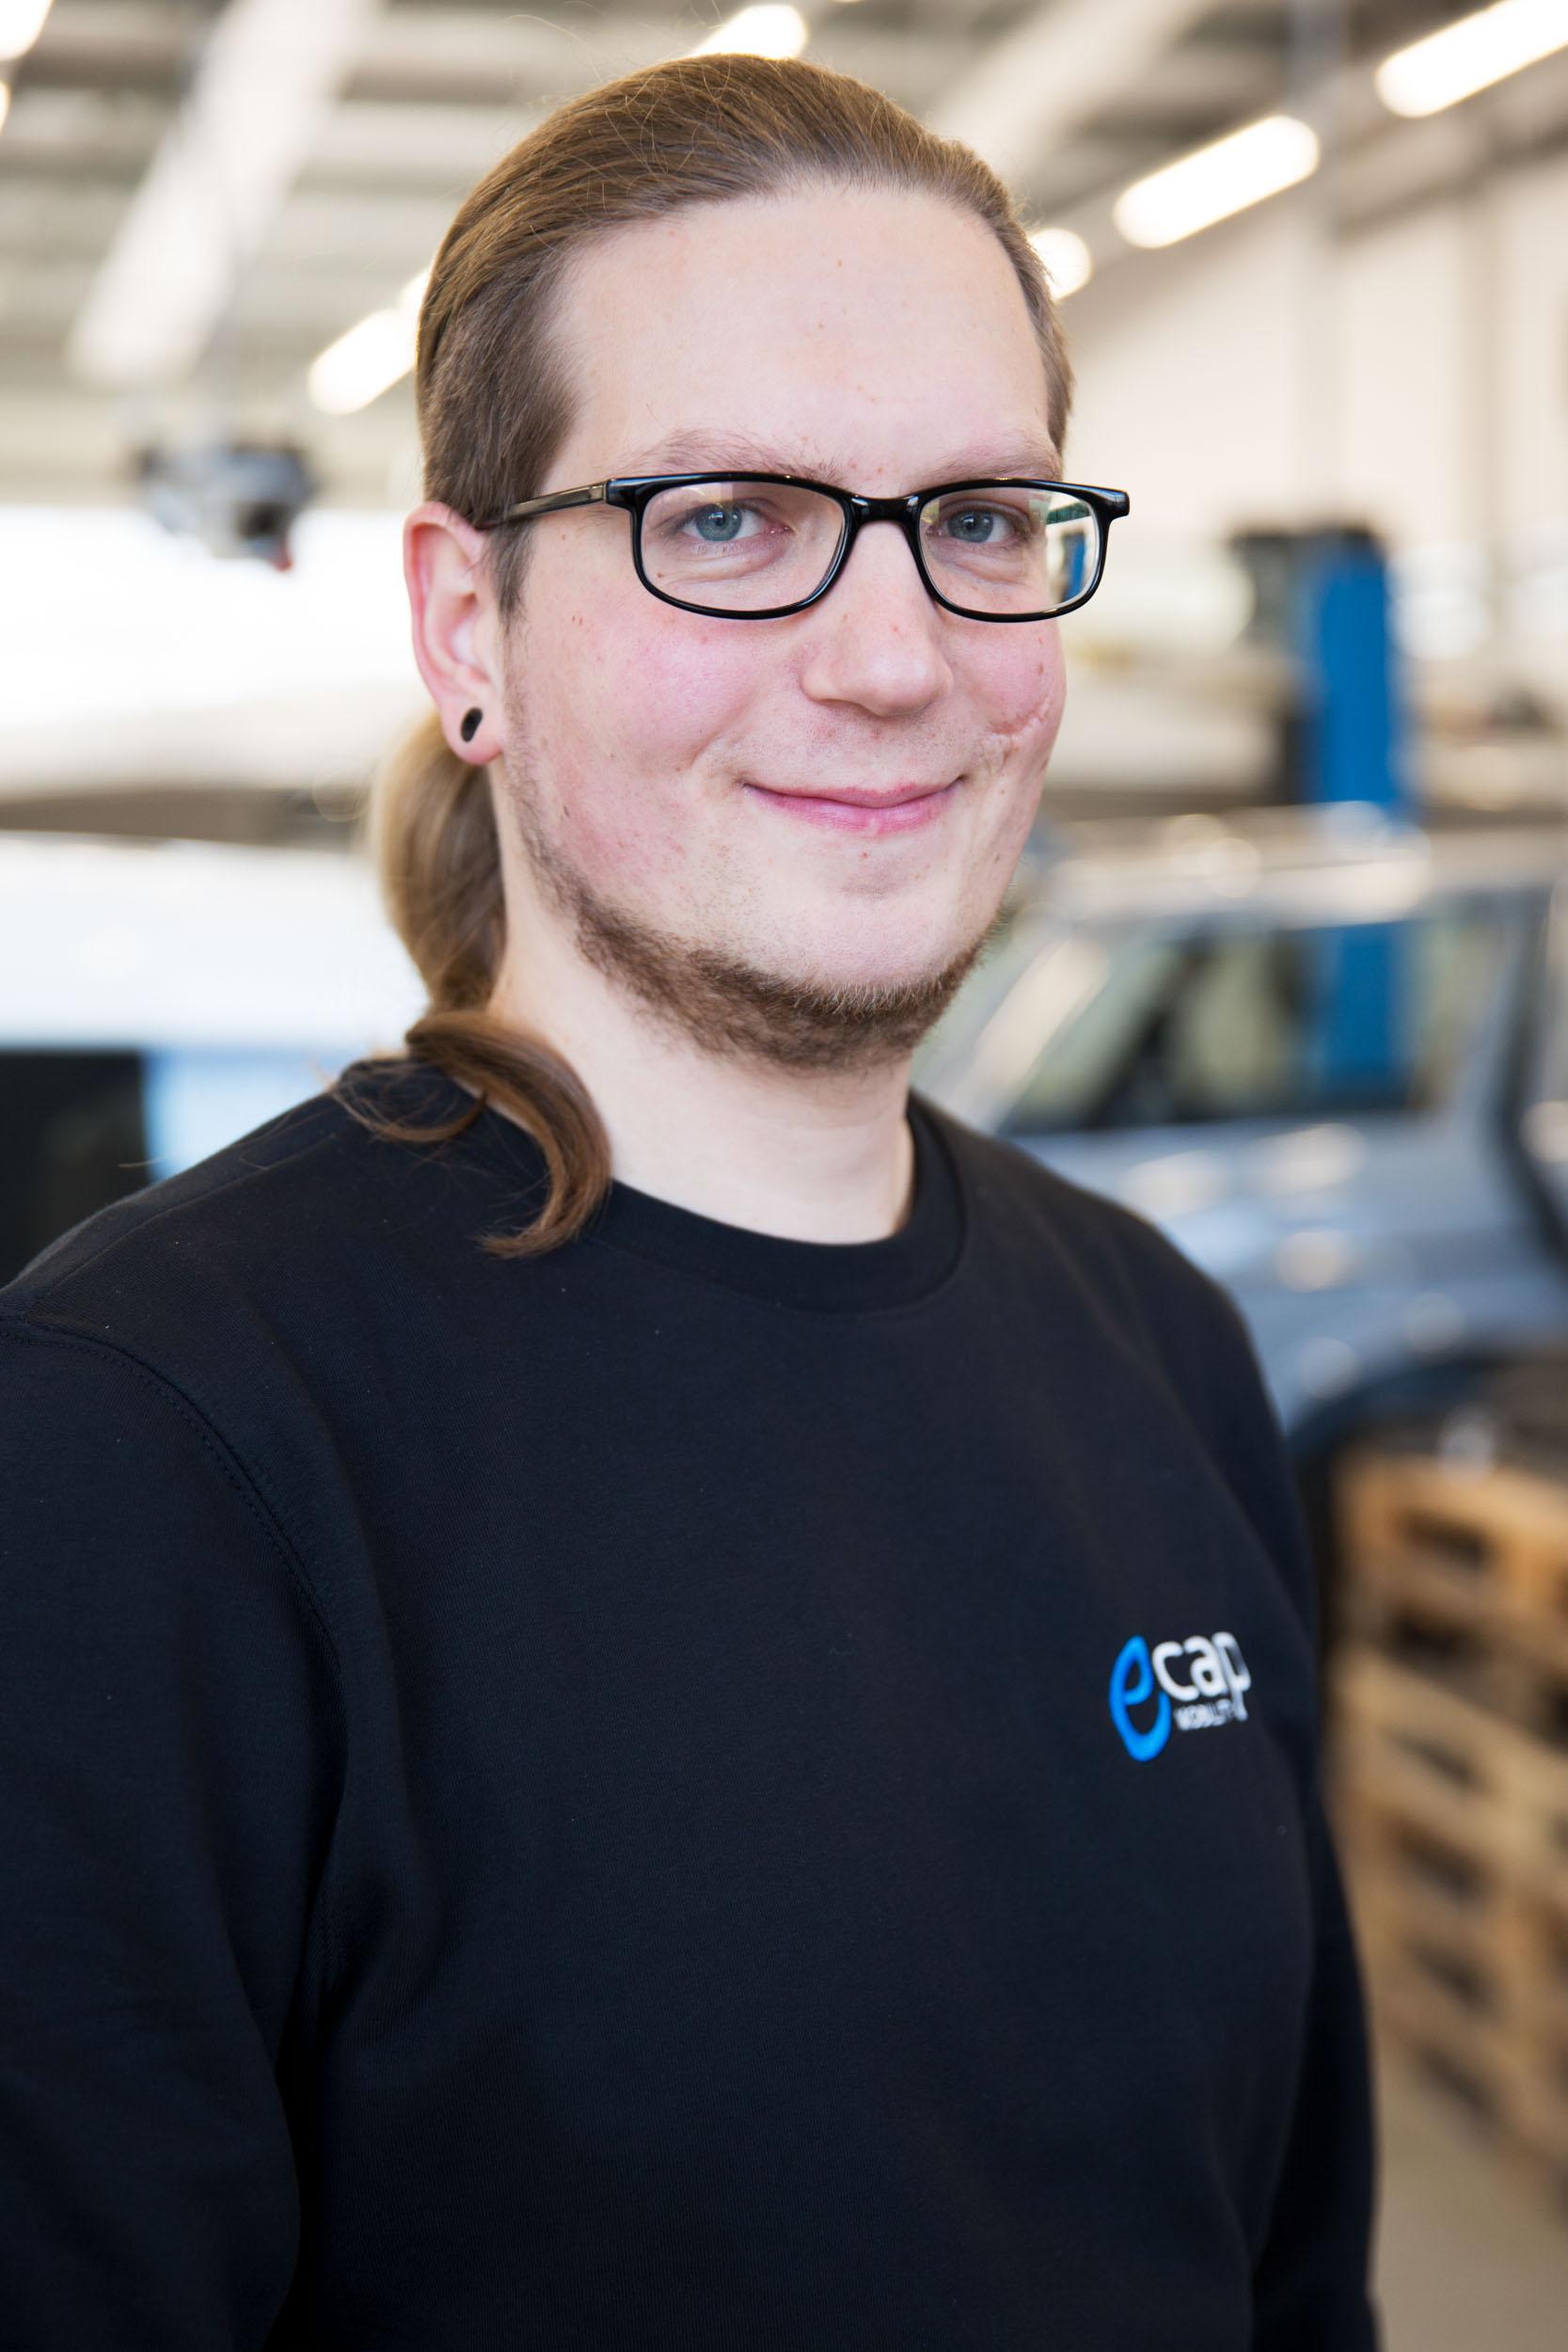 Daniel Wagenknecht | Software Development dwa@ecap-mobility.com